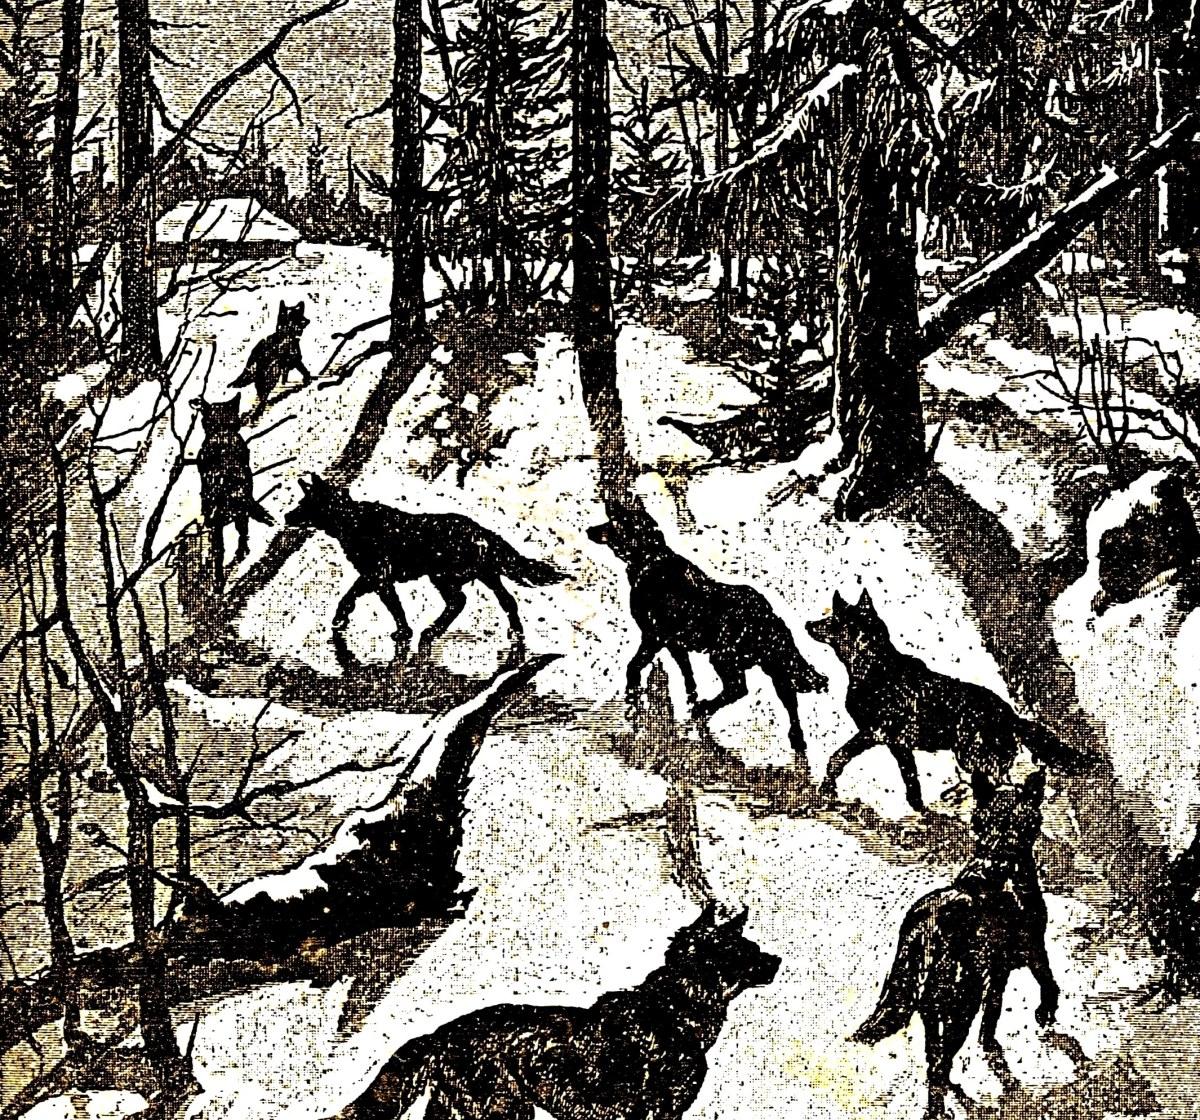 Мратенцы, они же Волчьи дни